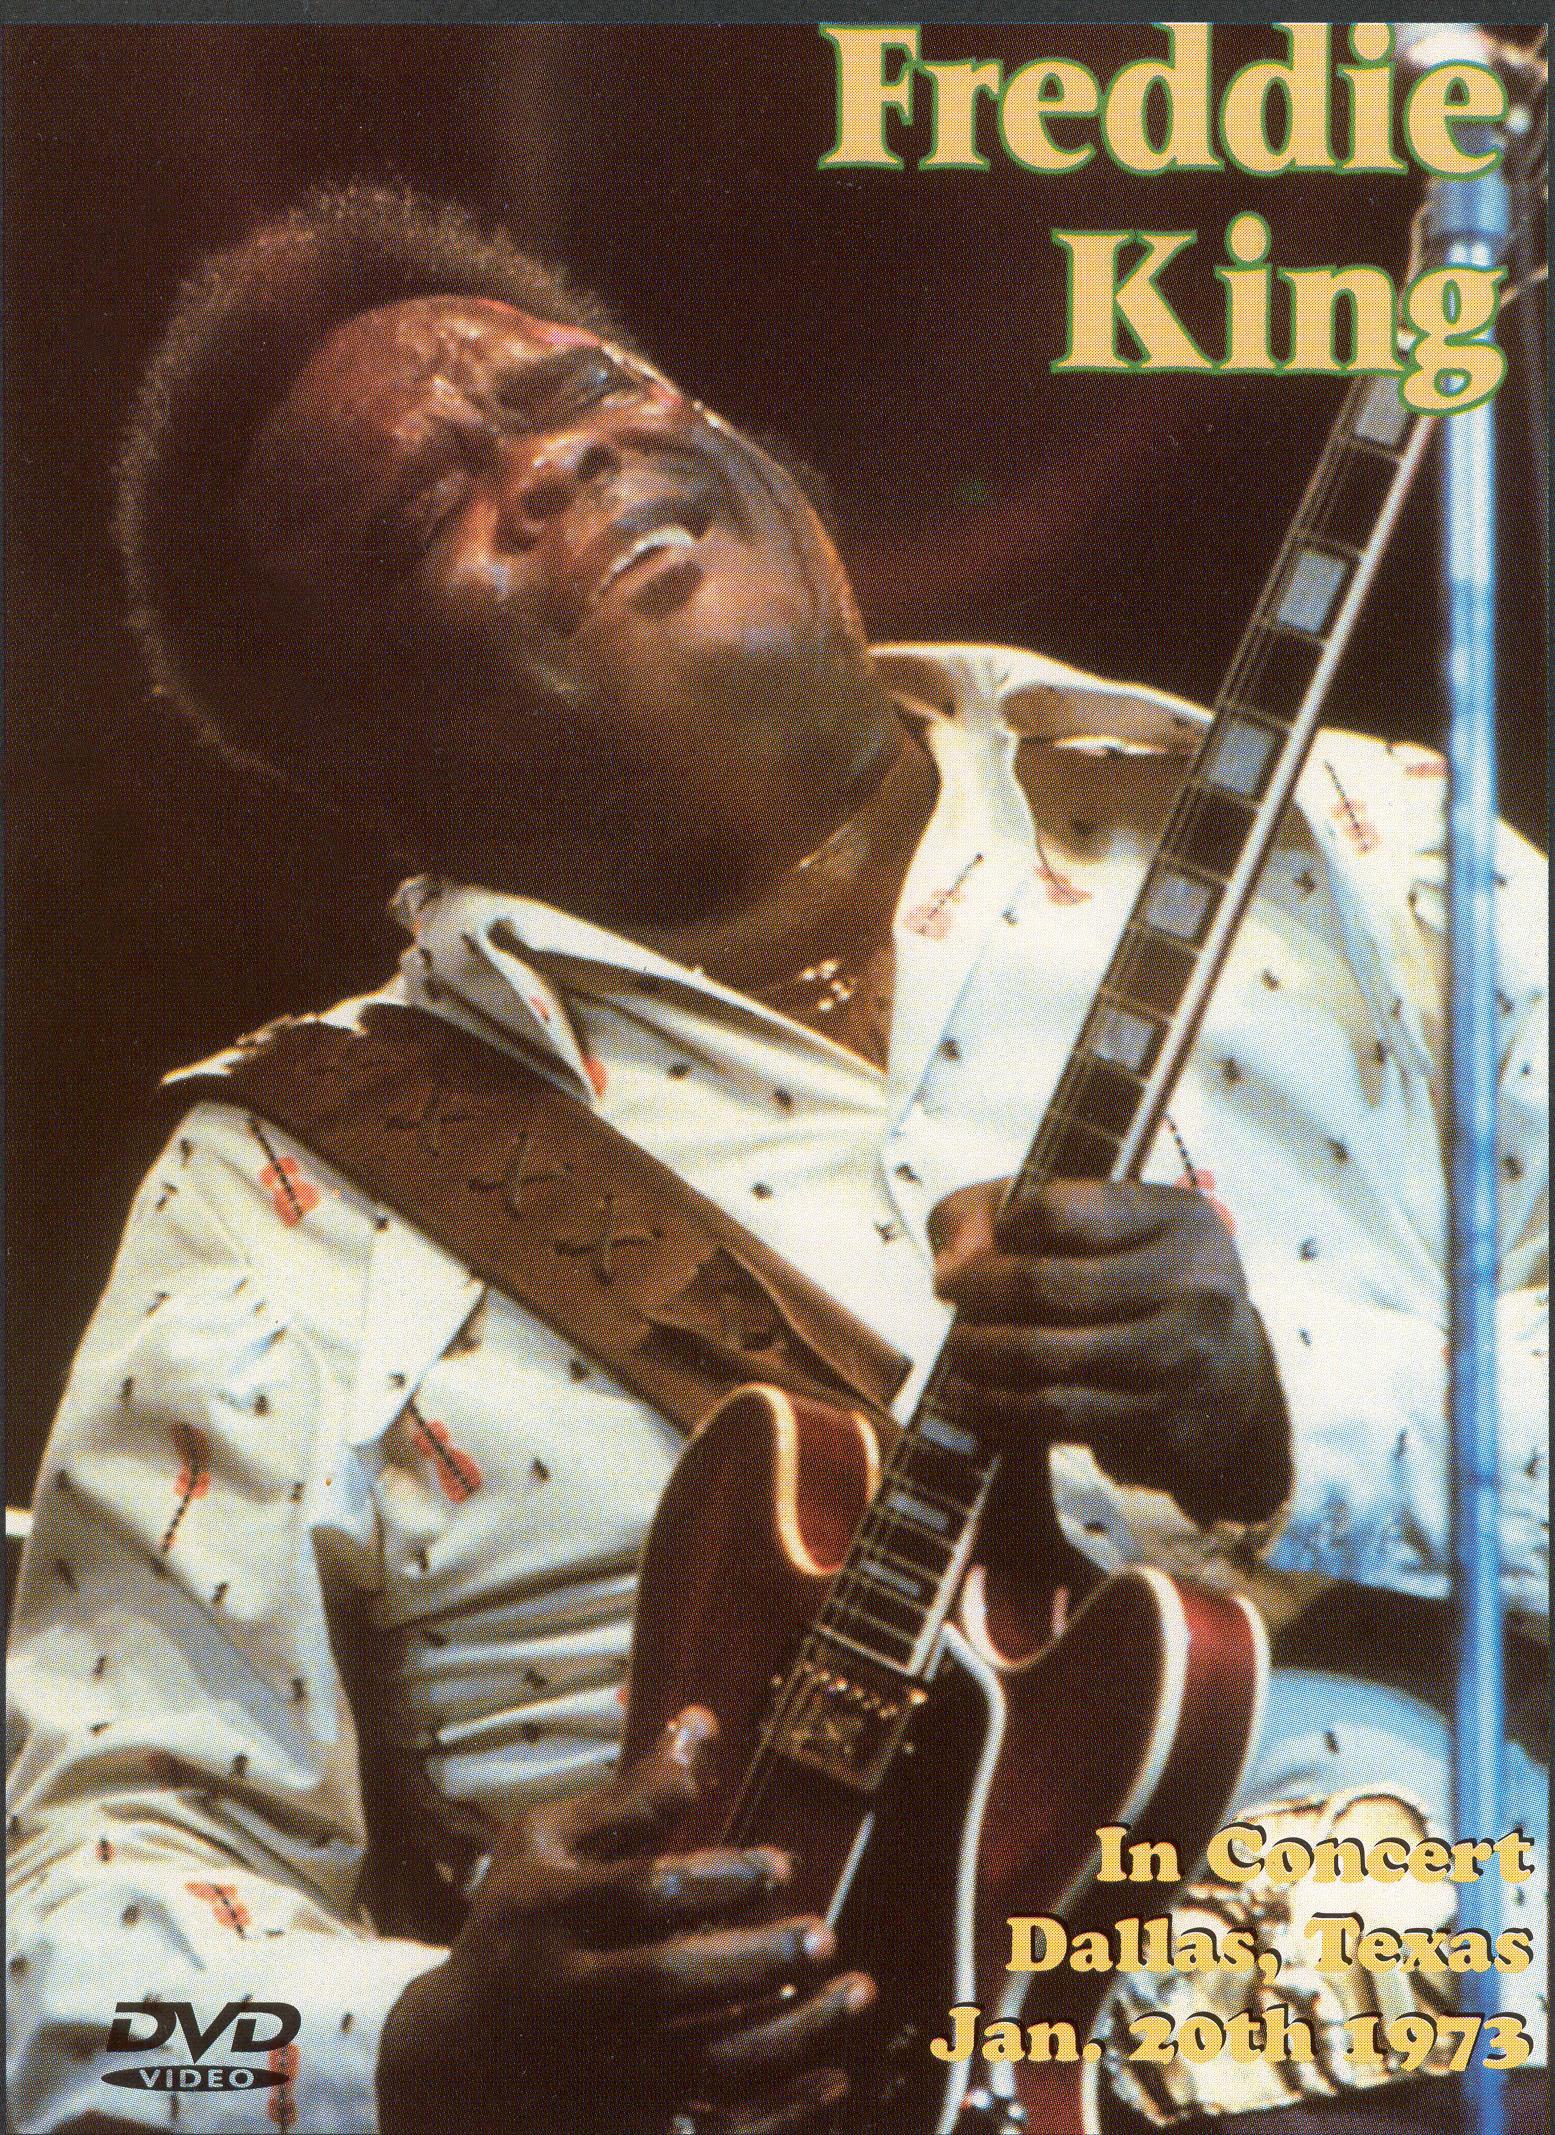 Freddie King: Dallas, Texas - Jan. 20th 1973